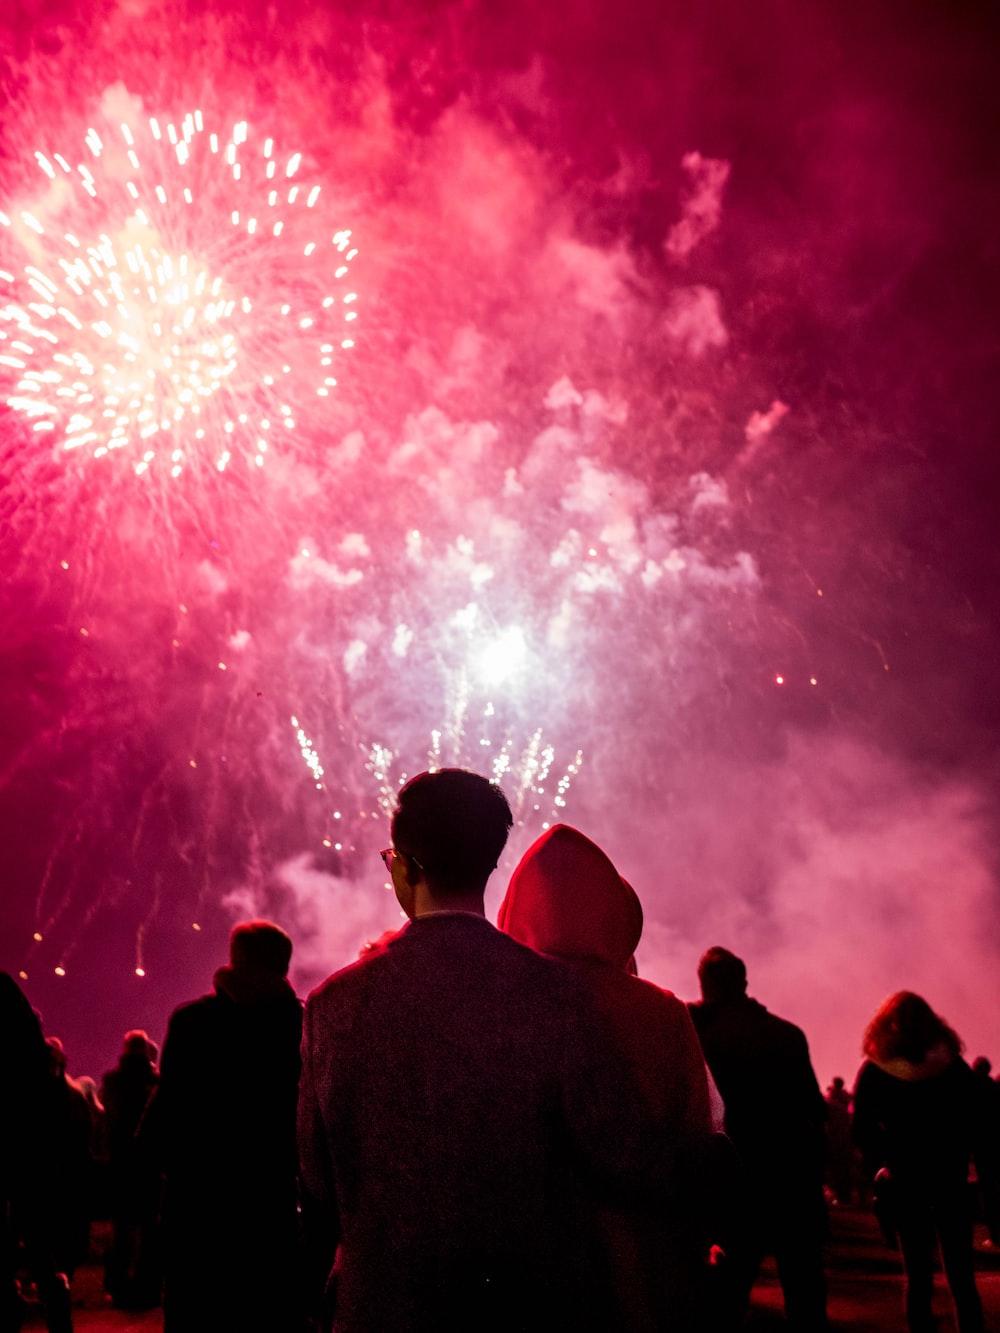 people watching fireworks during nighttime